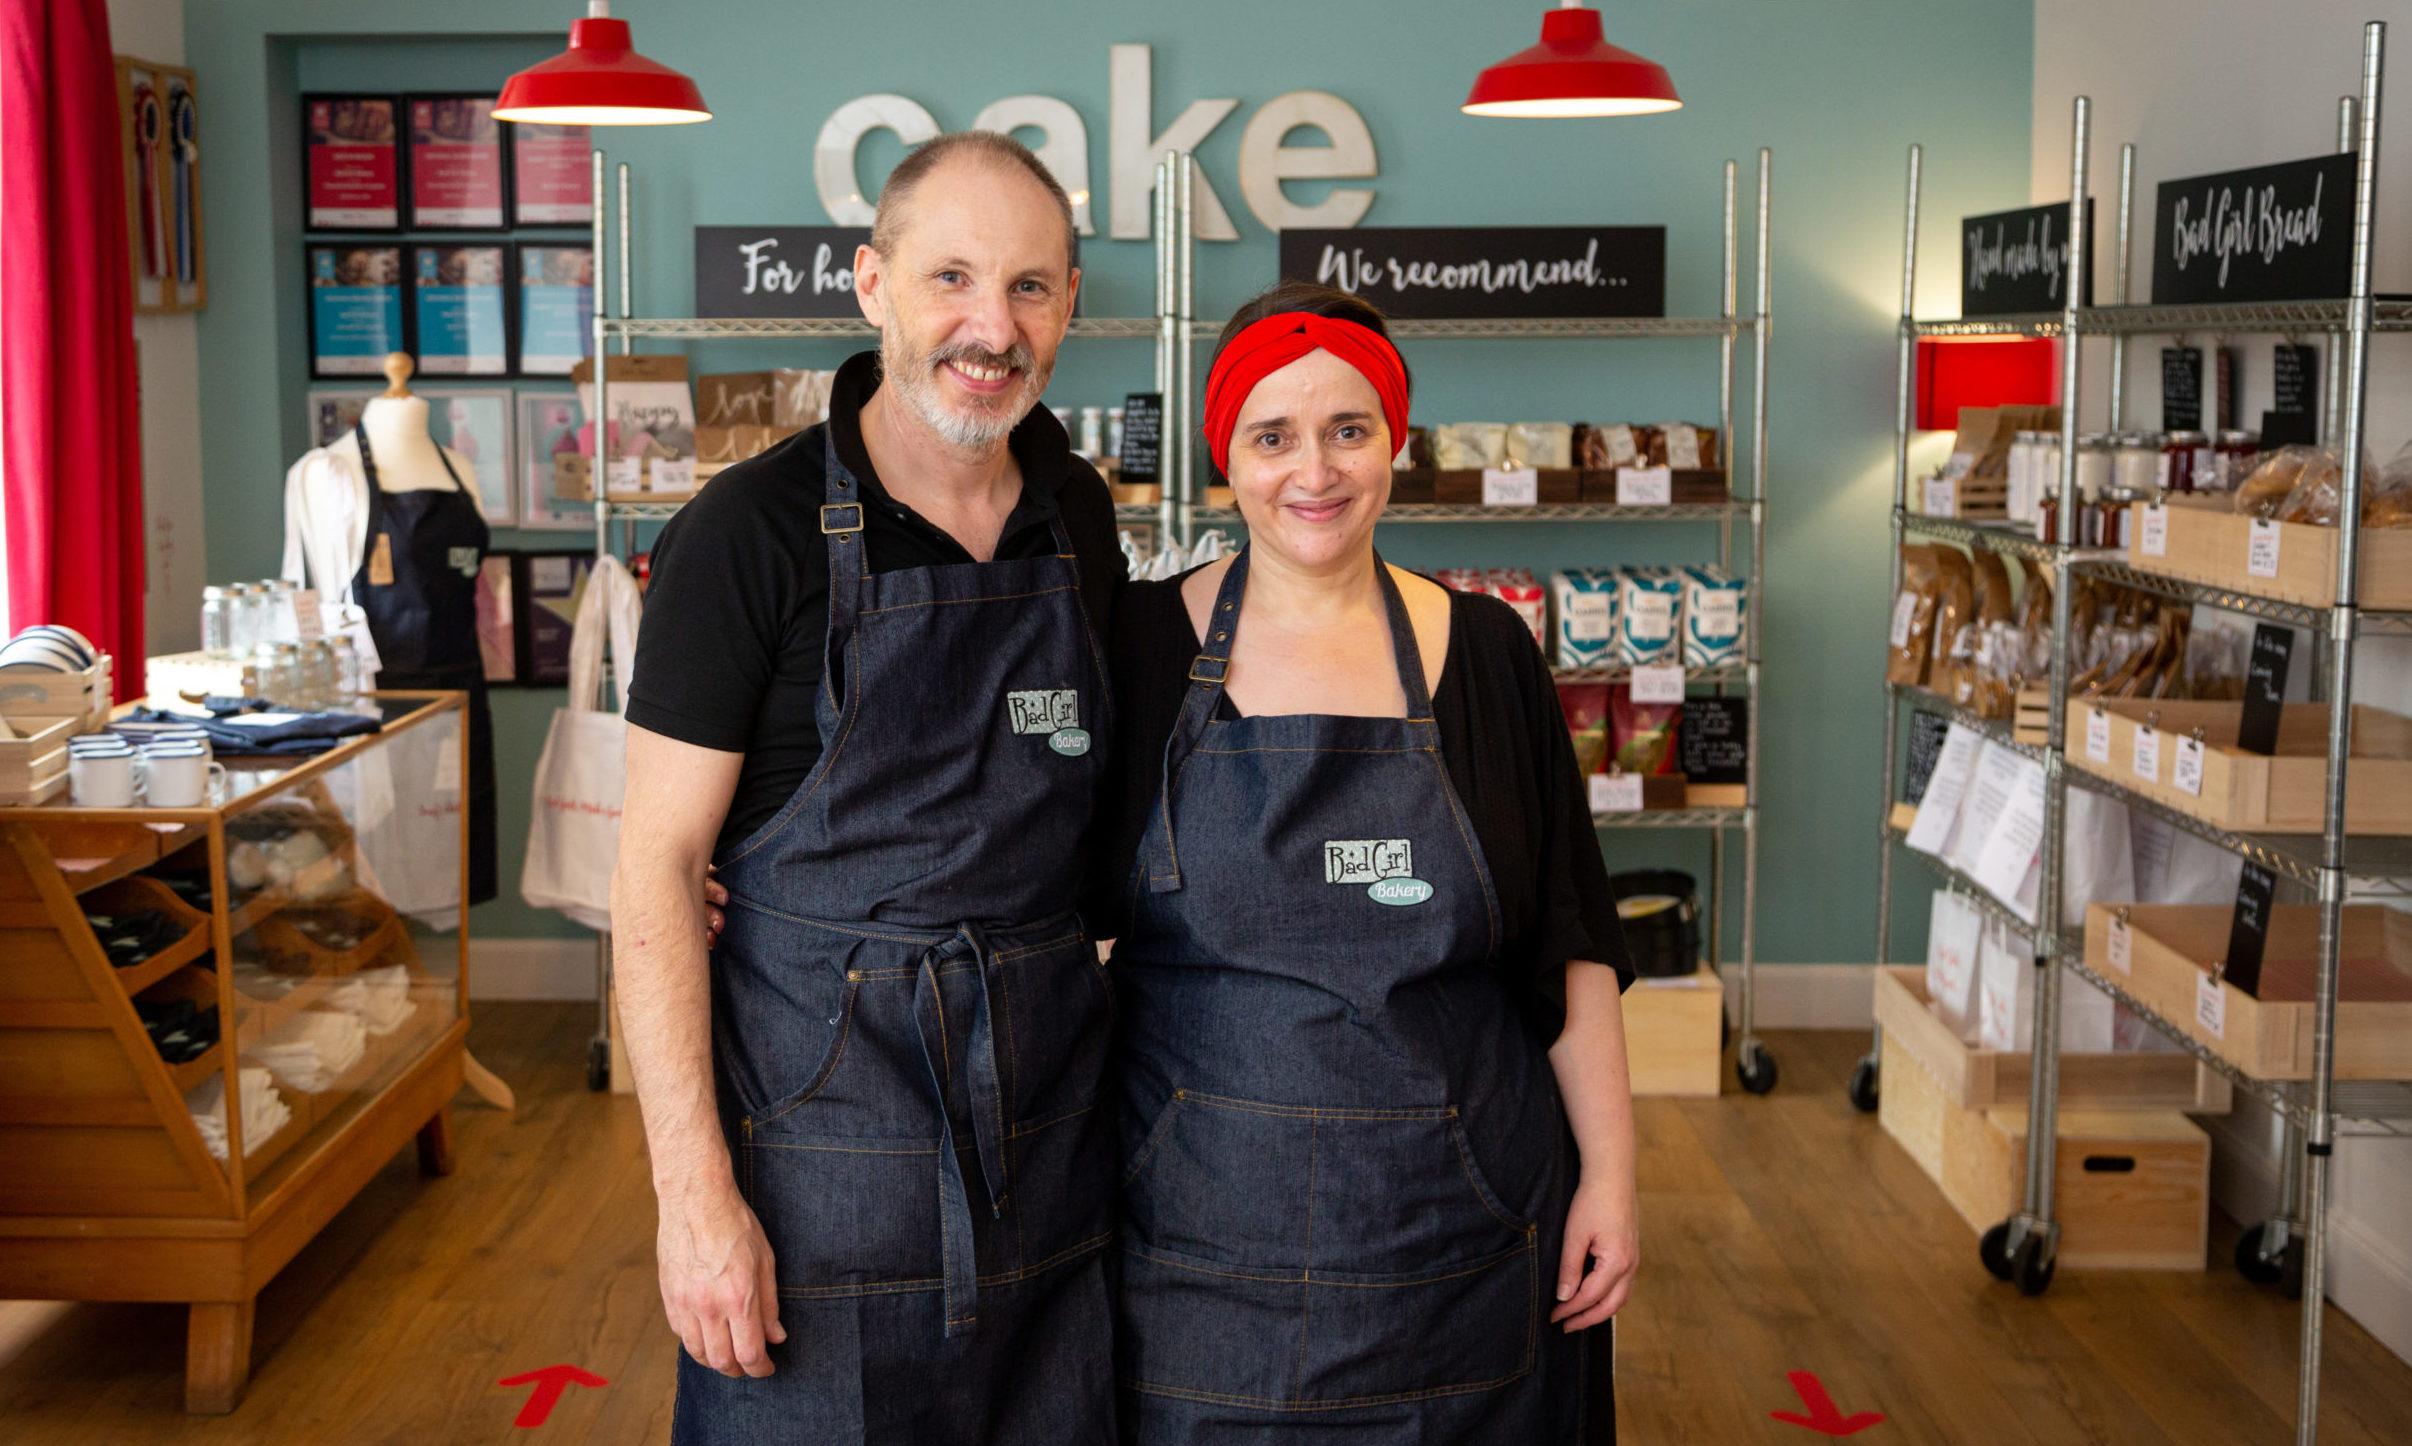 Bad Girl Bakery owners Douglas and Jeni Hardie.